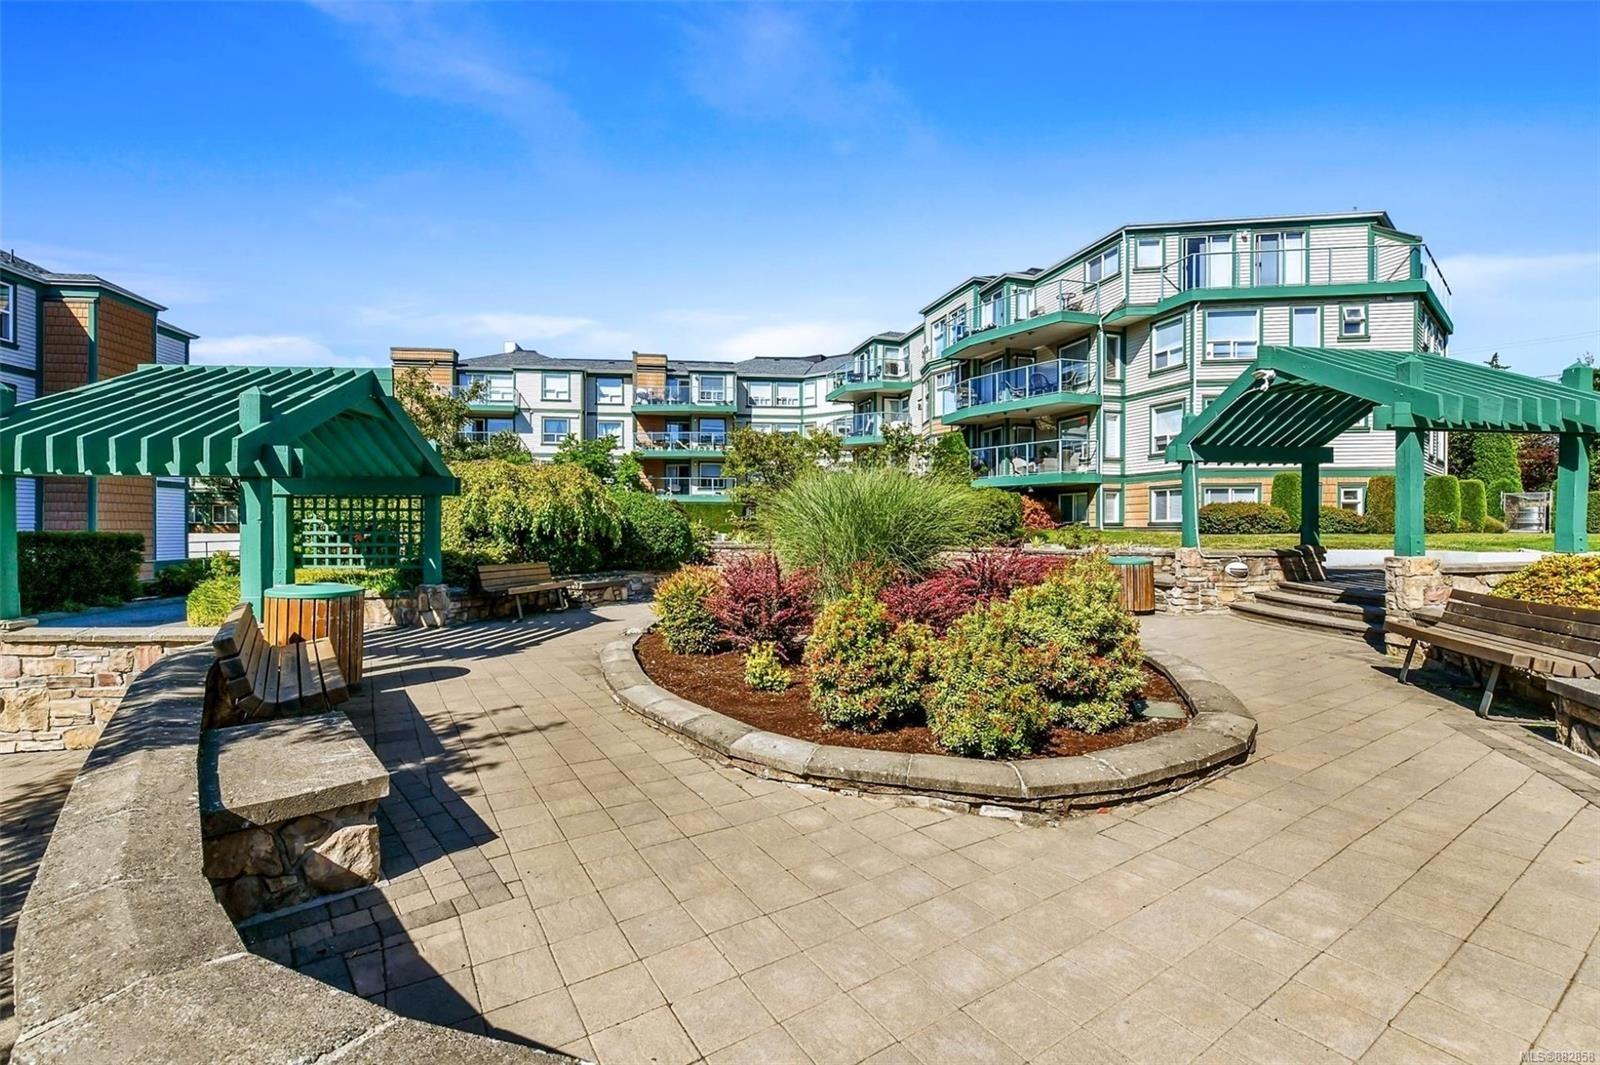 Main Photo: 414 899 Darwin Ave in : SE Swan Lake Condo for sale (Saanich East)  : MLS®# 882858